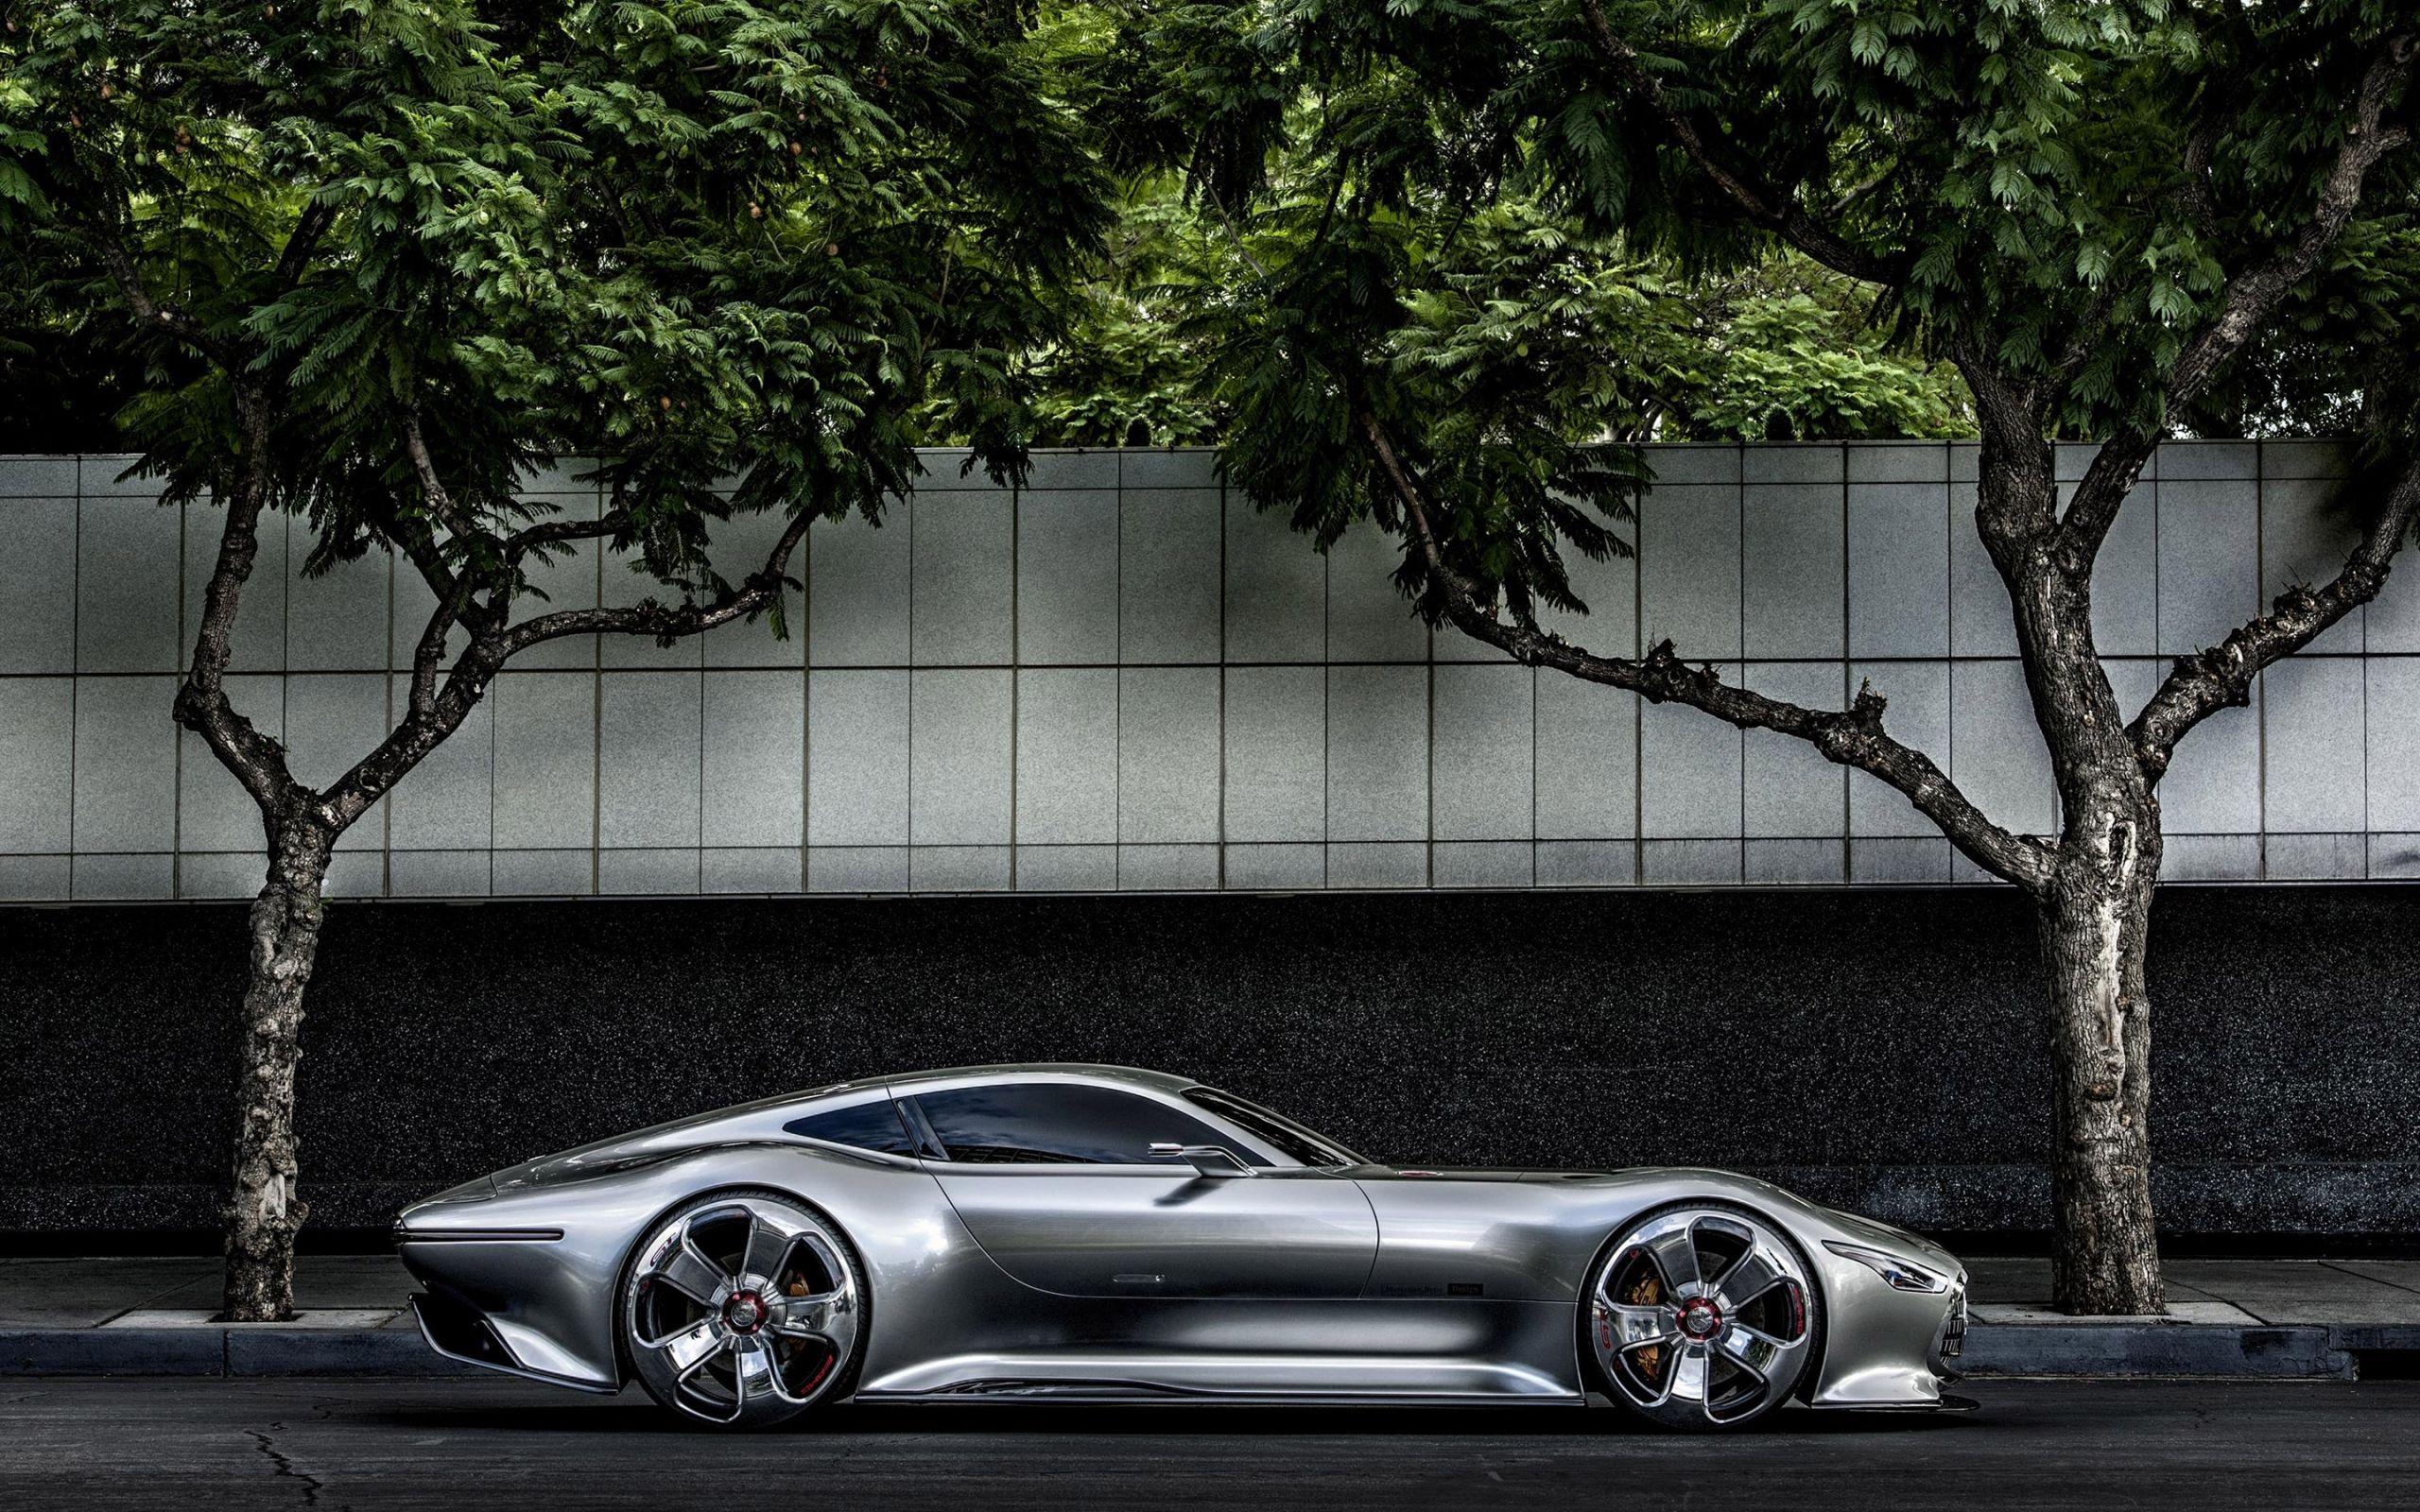 Mercedes vision gran turismo willkommen im cars computer club